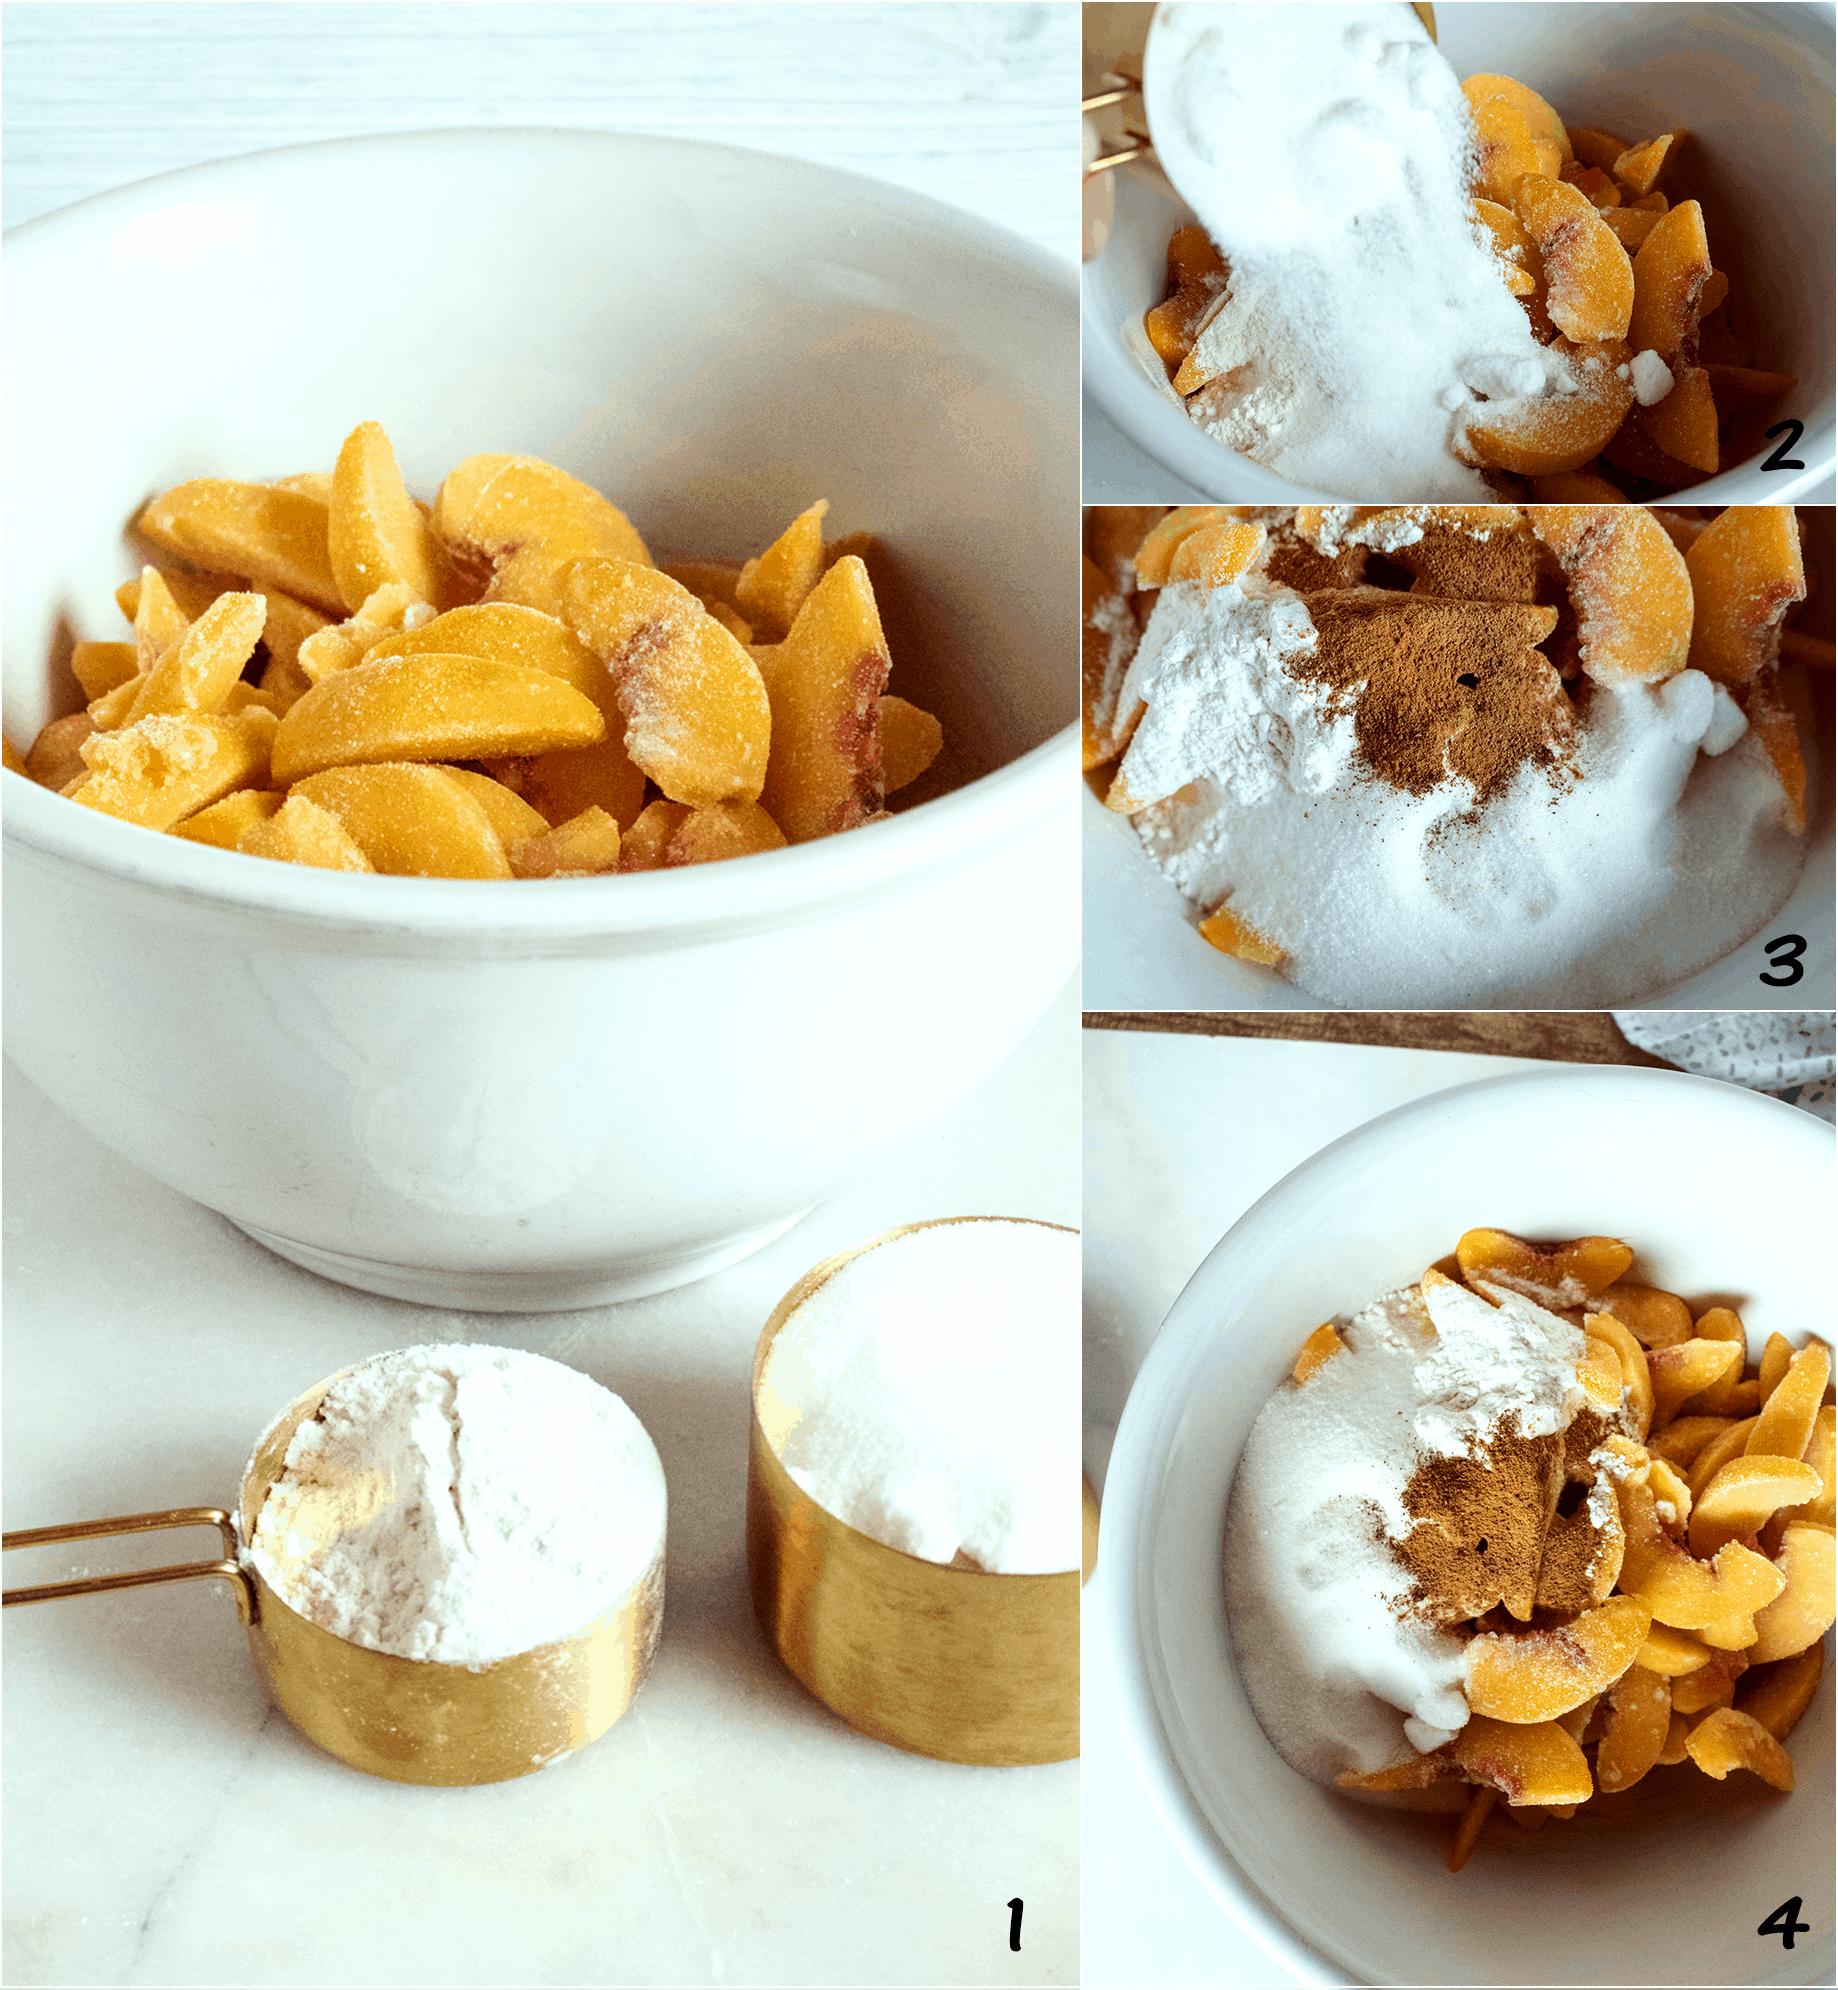 how to make homemade peach pie steps